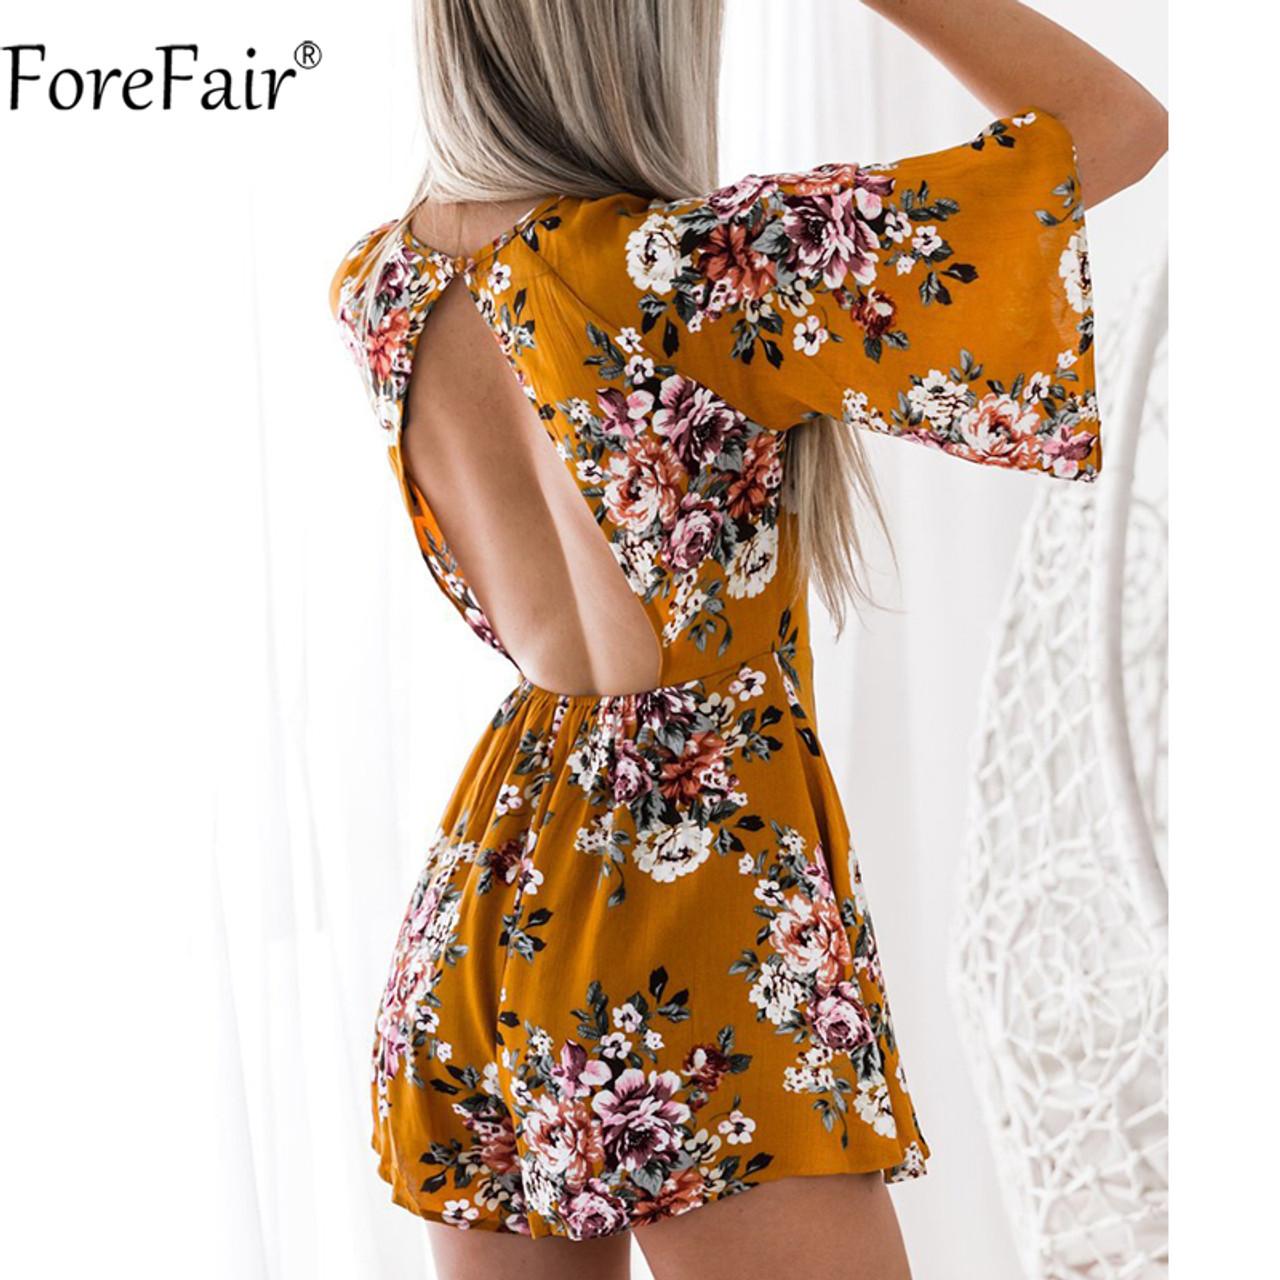 38039807122c ForeFair Sexy Open Back Half Flare Sleeve Chiffon Playsuit Floral Print  Empire Elegant Romper Women jumpsuits ...